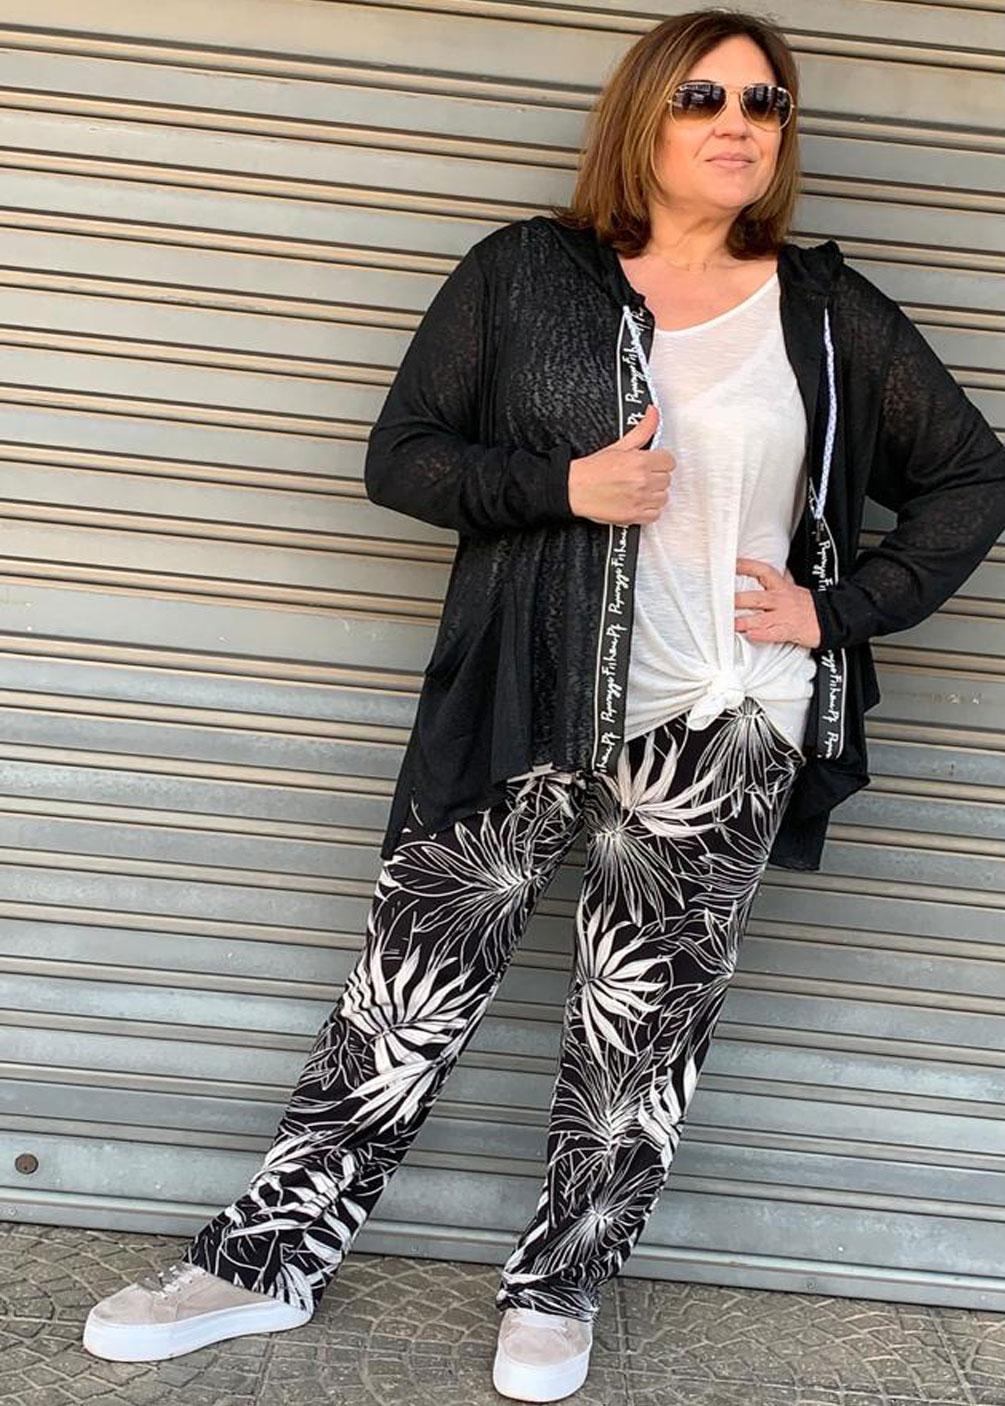 pantalones verano tallas grandes indra